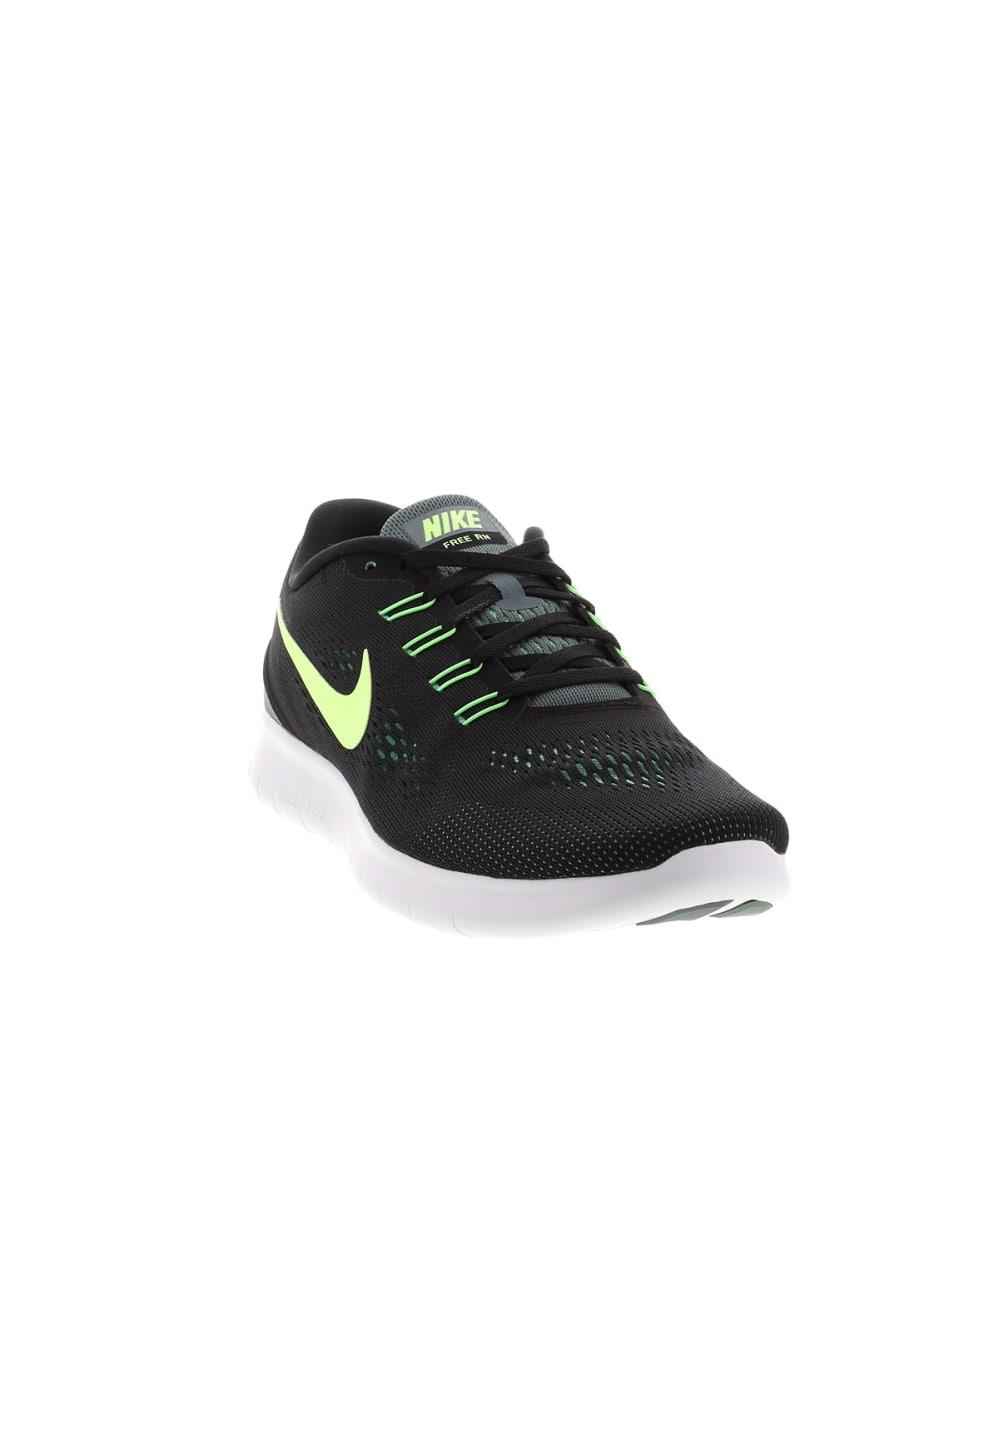 By Photo Congress || Tenis Nike Free Run Hombre